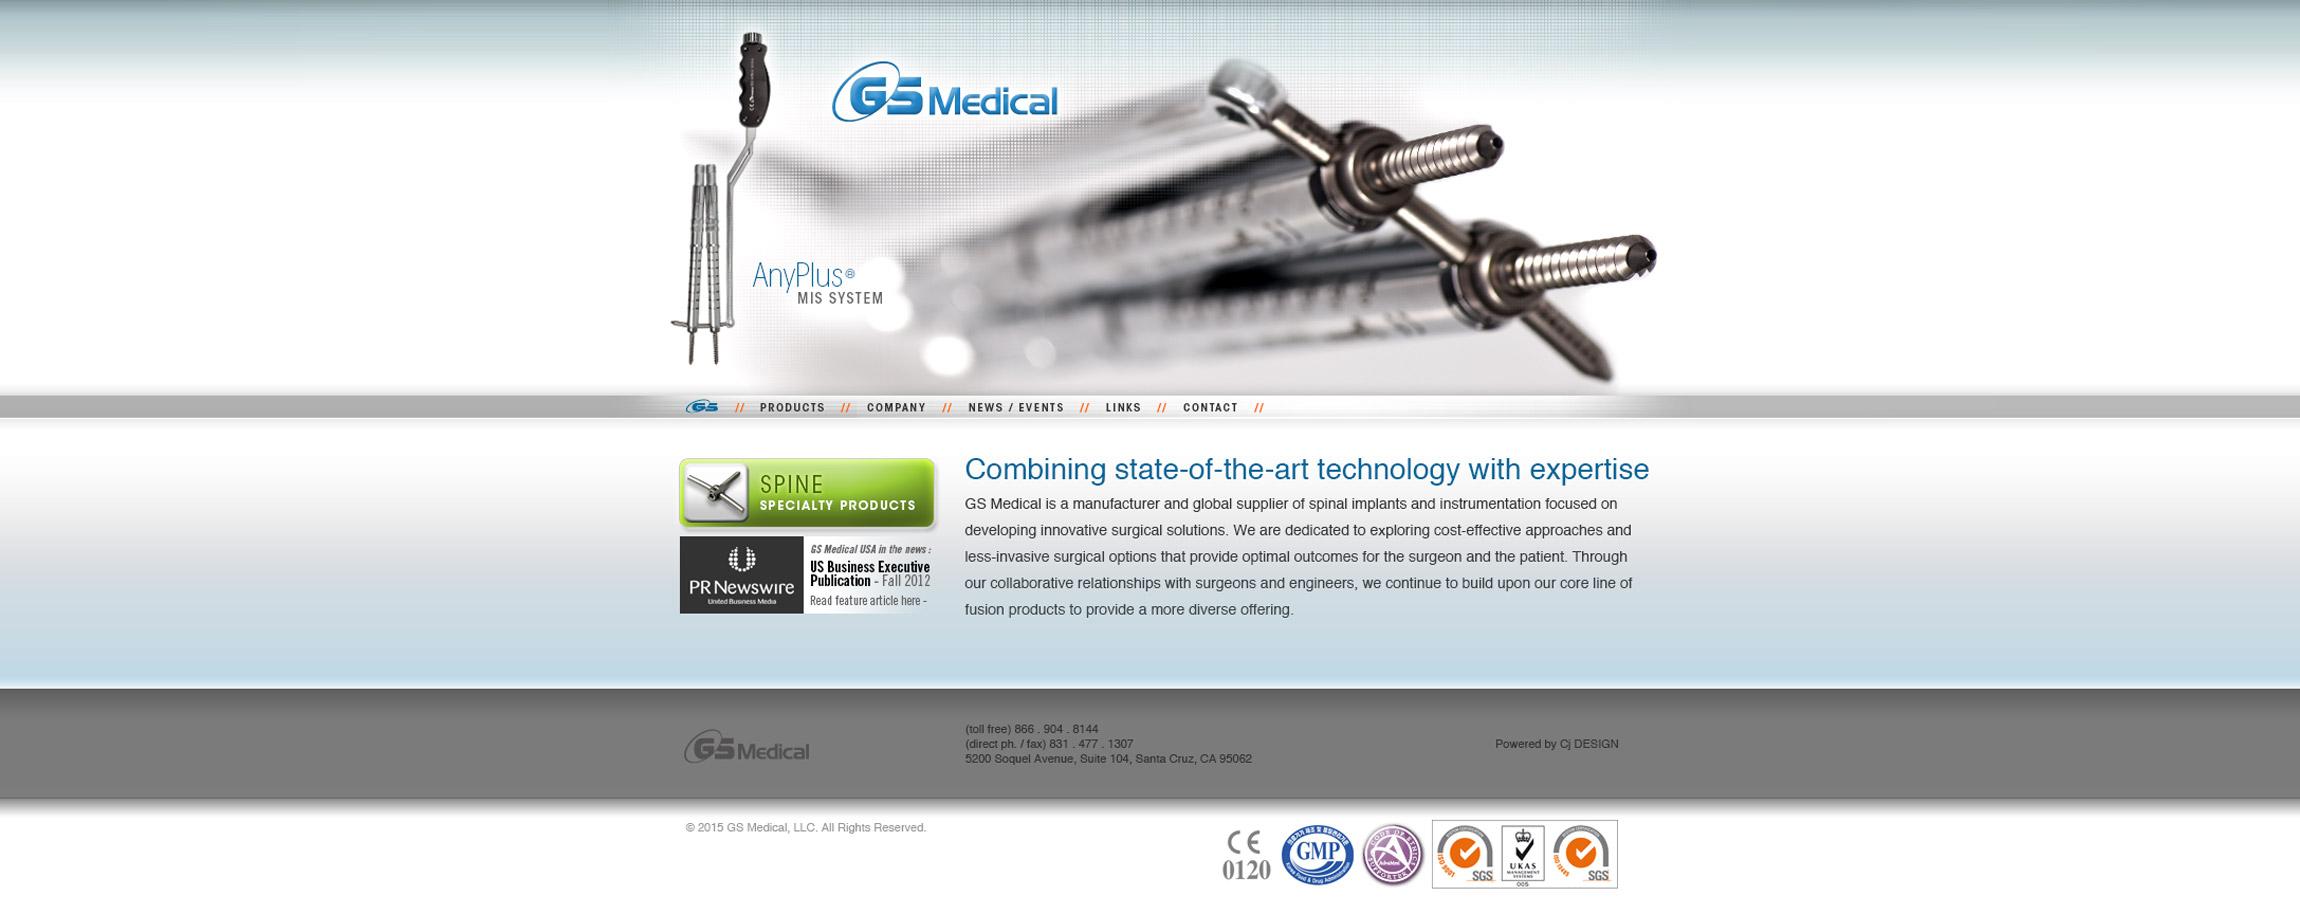 GS Medical USA Website Home Page cervical surgery medical - Graphic Regime